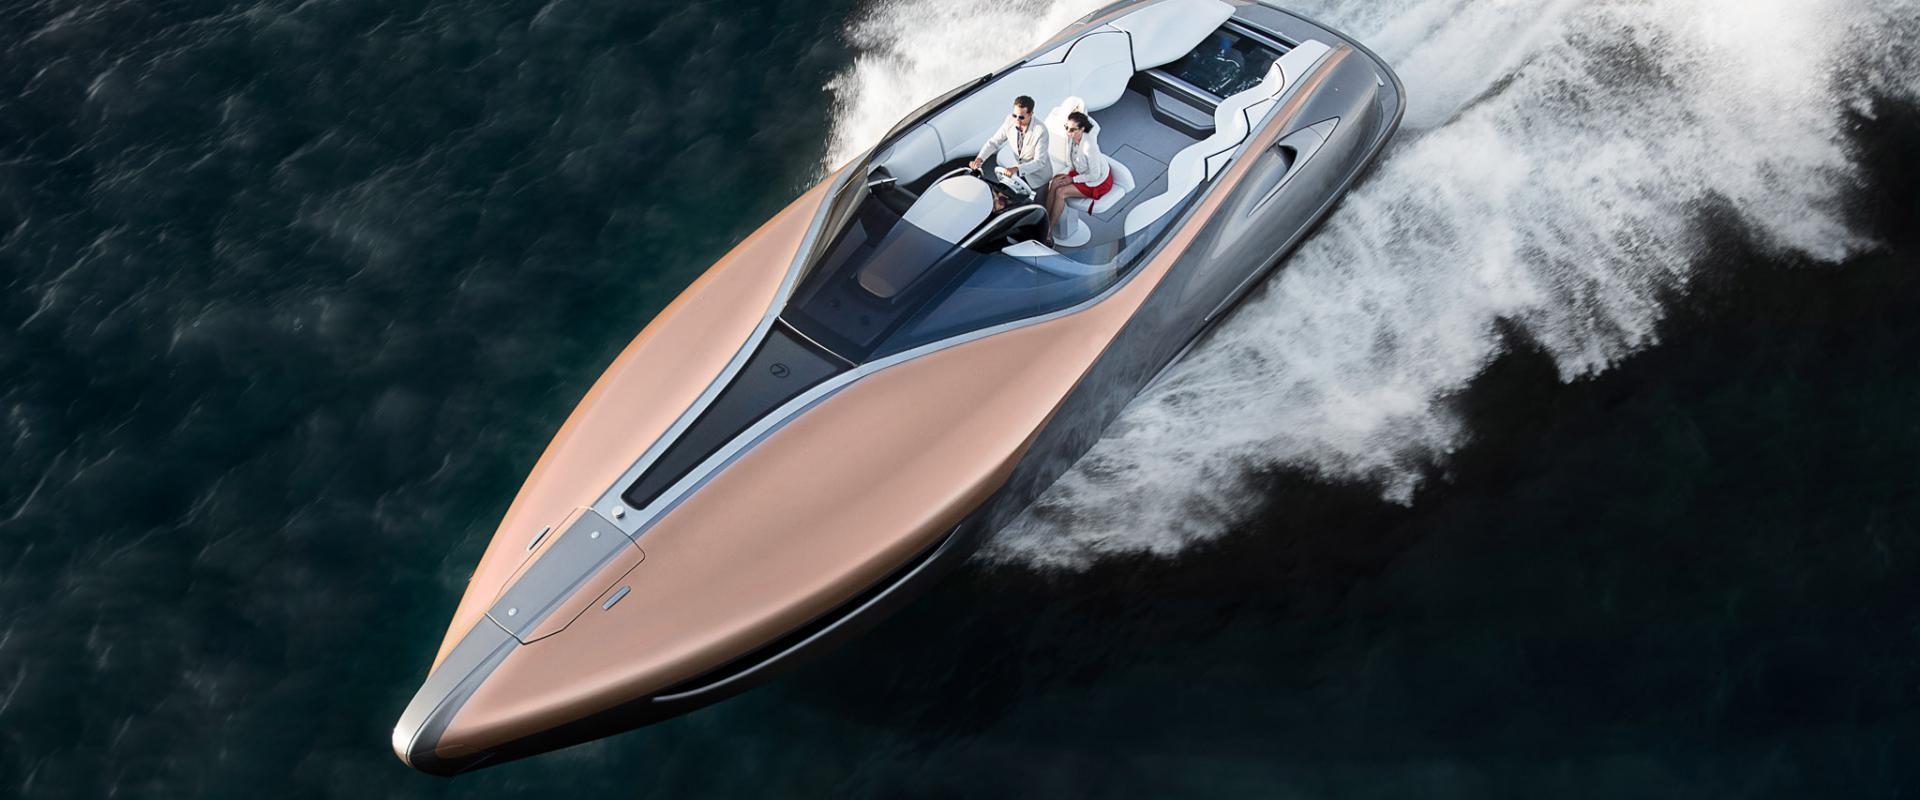 Concept Sport Yacht, Lexus nel mondo della nautica1_0-itok=2MhBpQYd.jpg